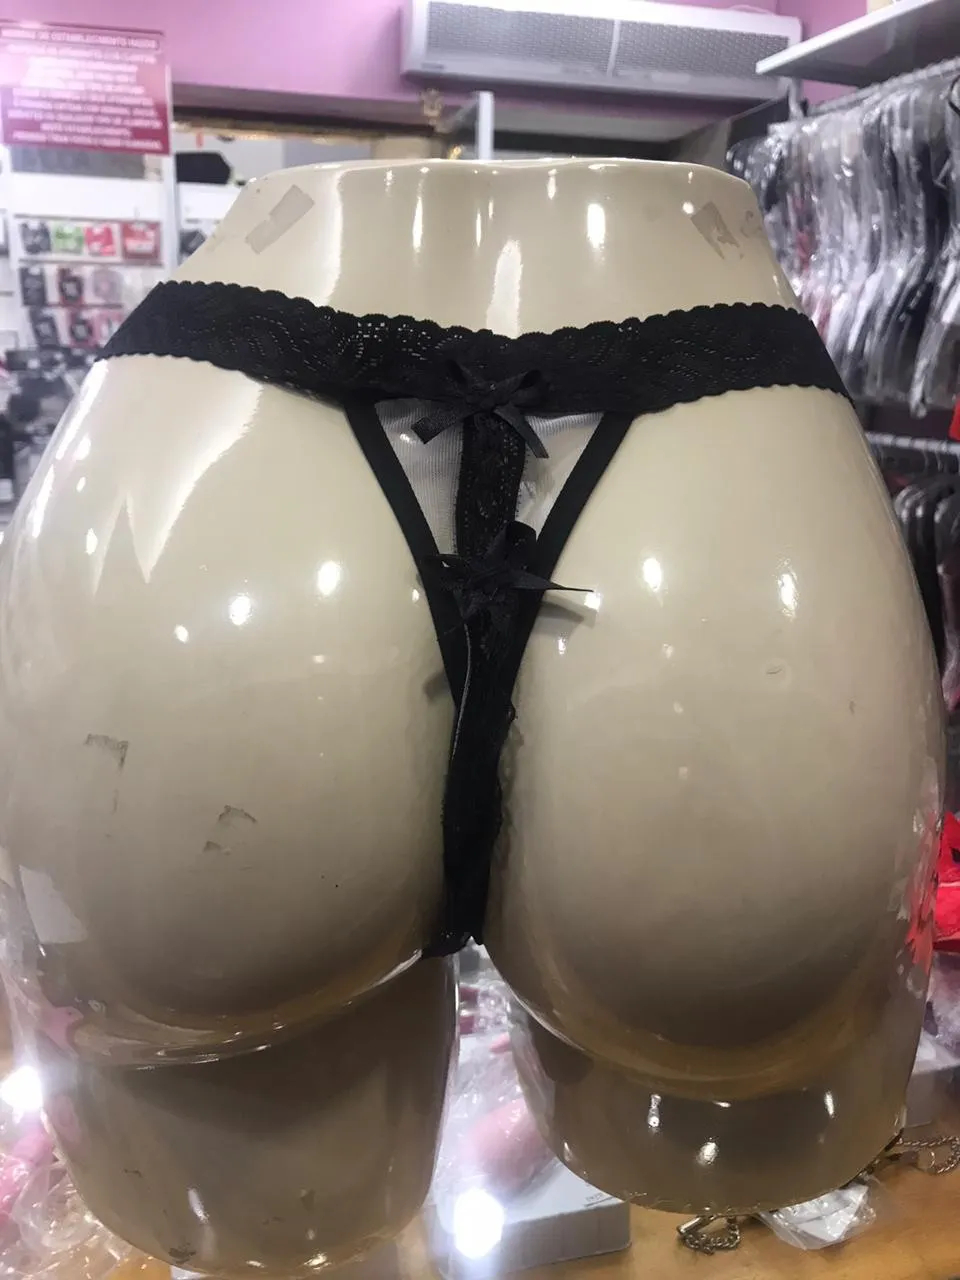 Tanga Apressadinha - Erotika